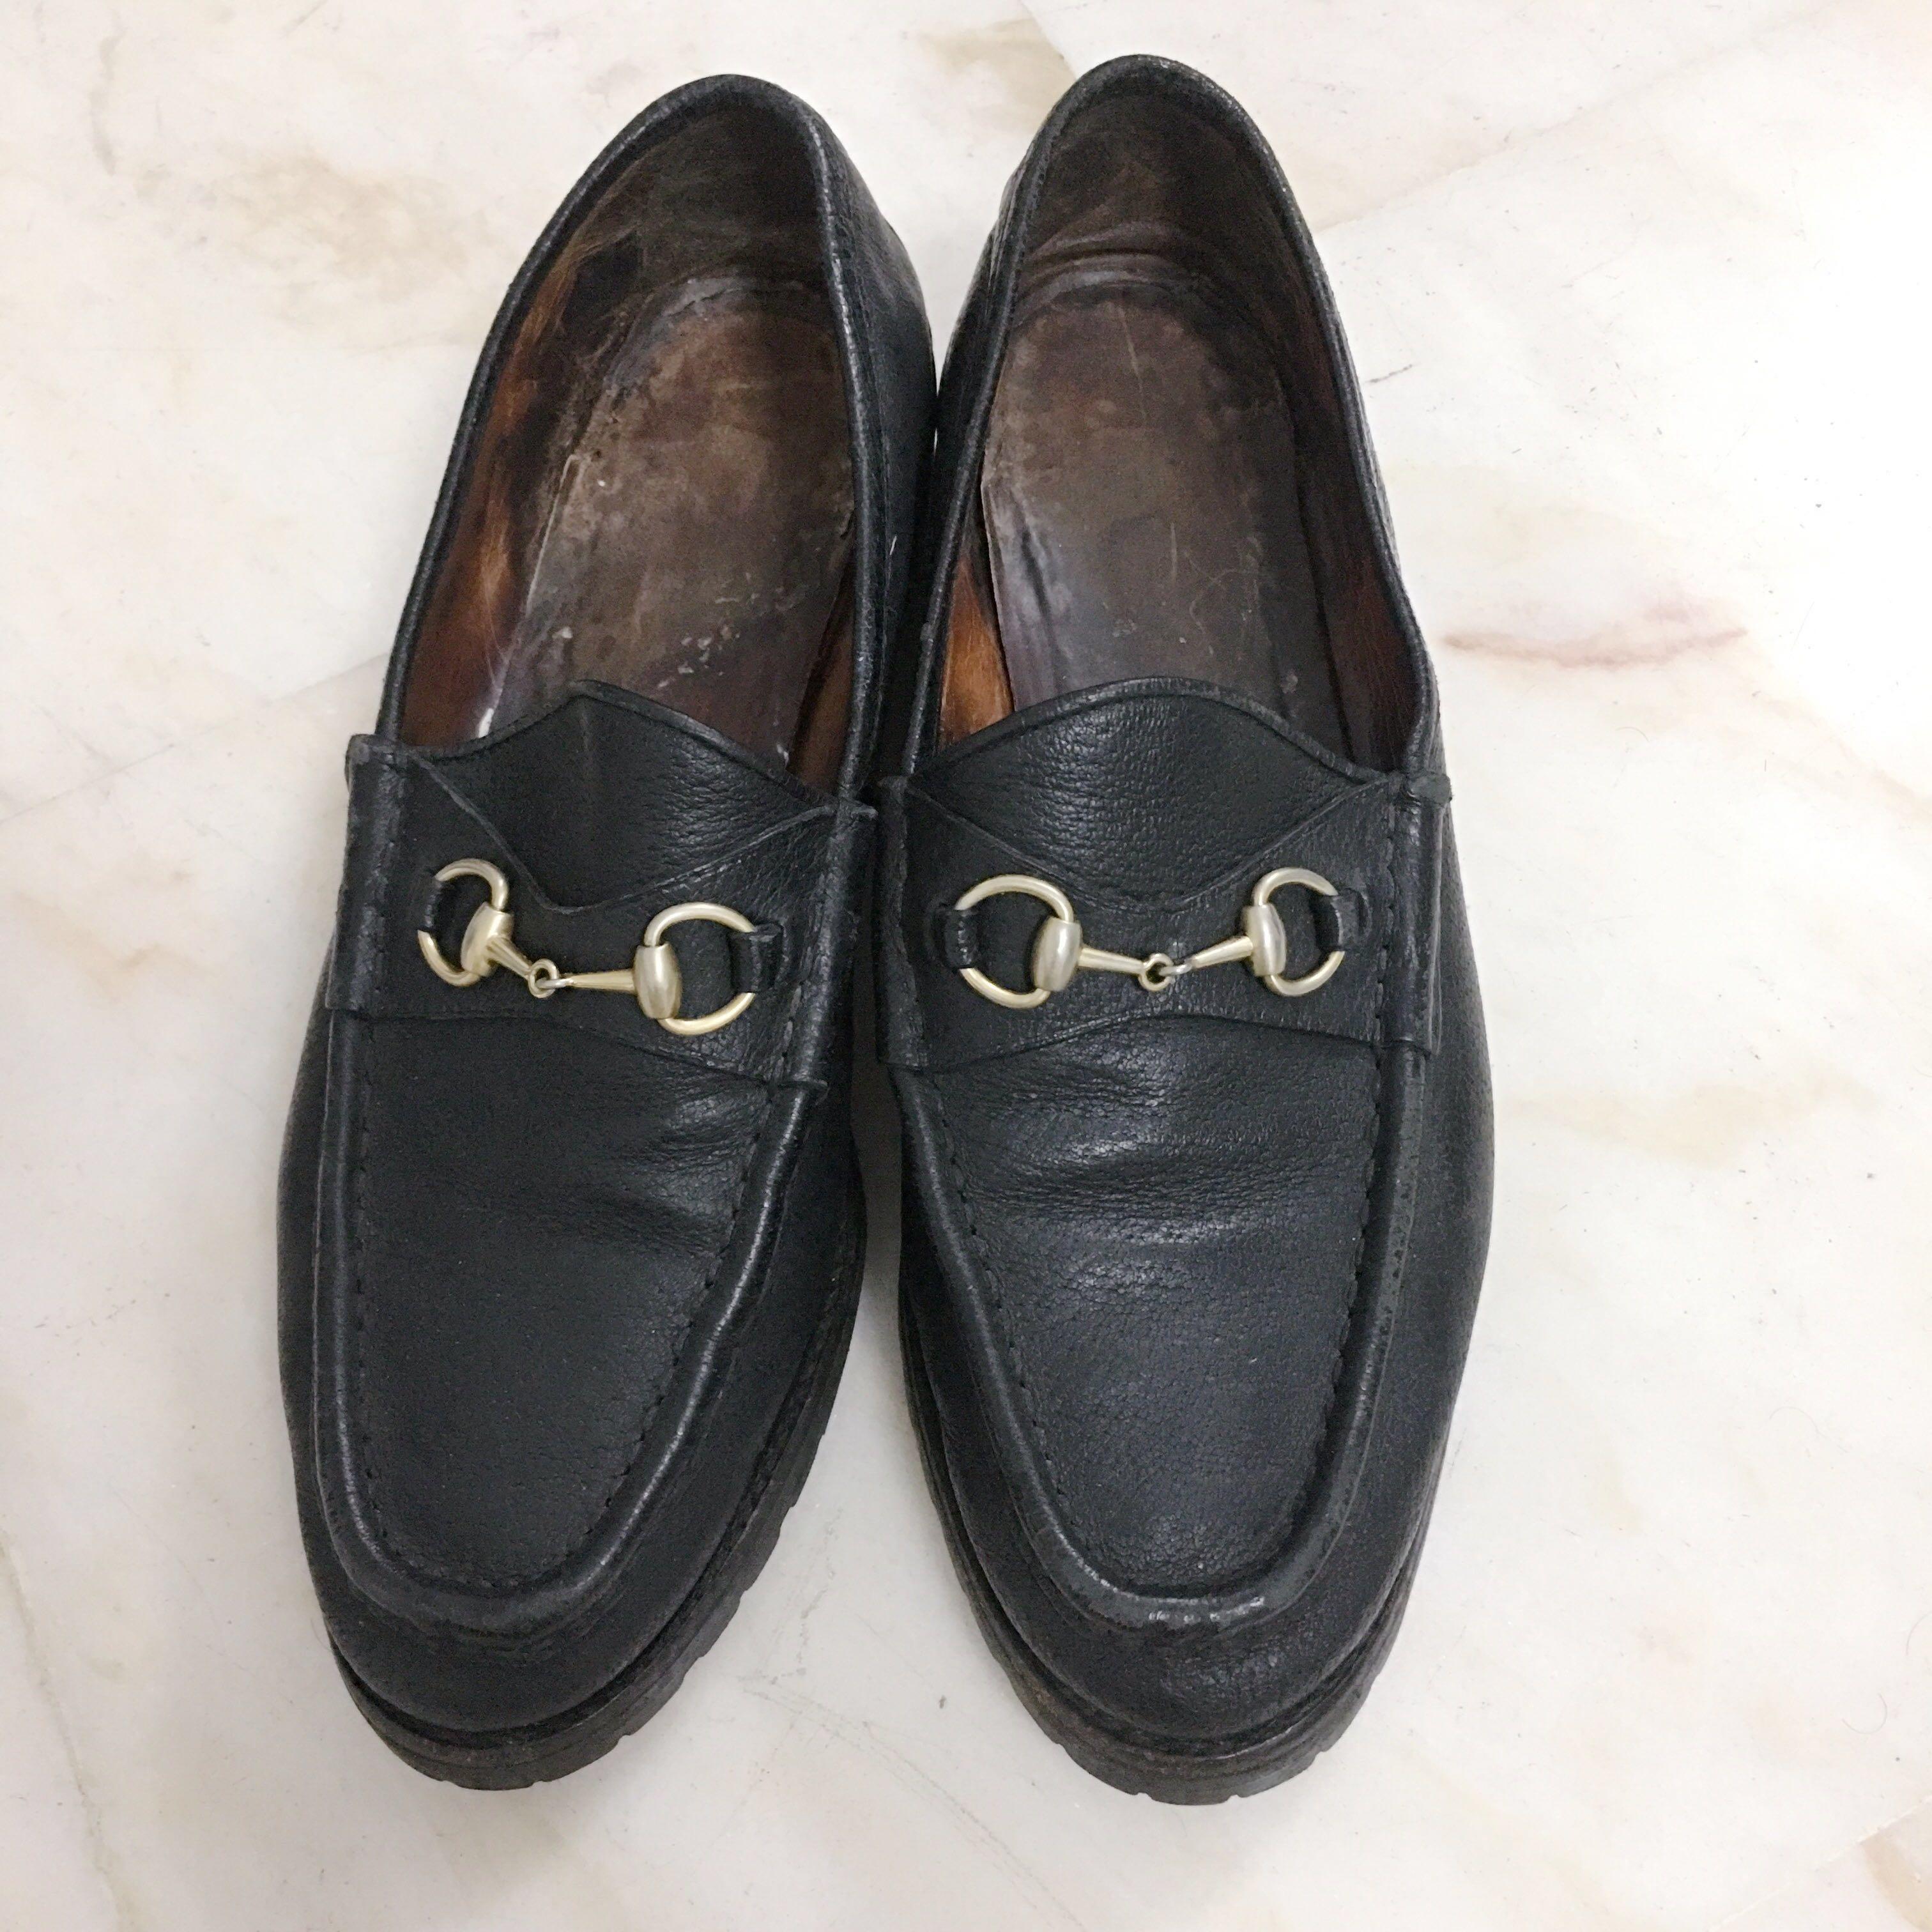 31816f588c9 Gucci Black Horsebit Loafers 101 6105